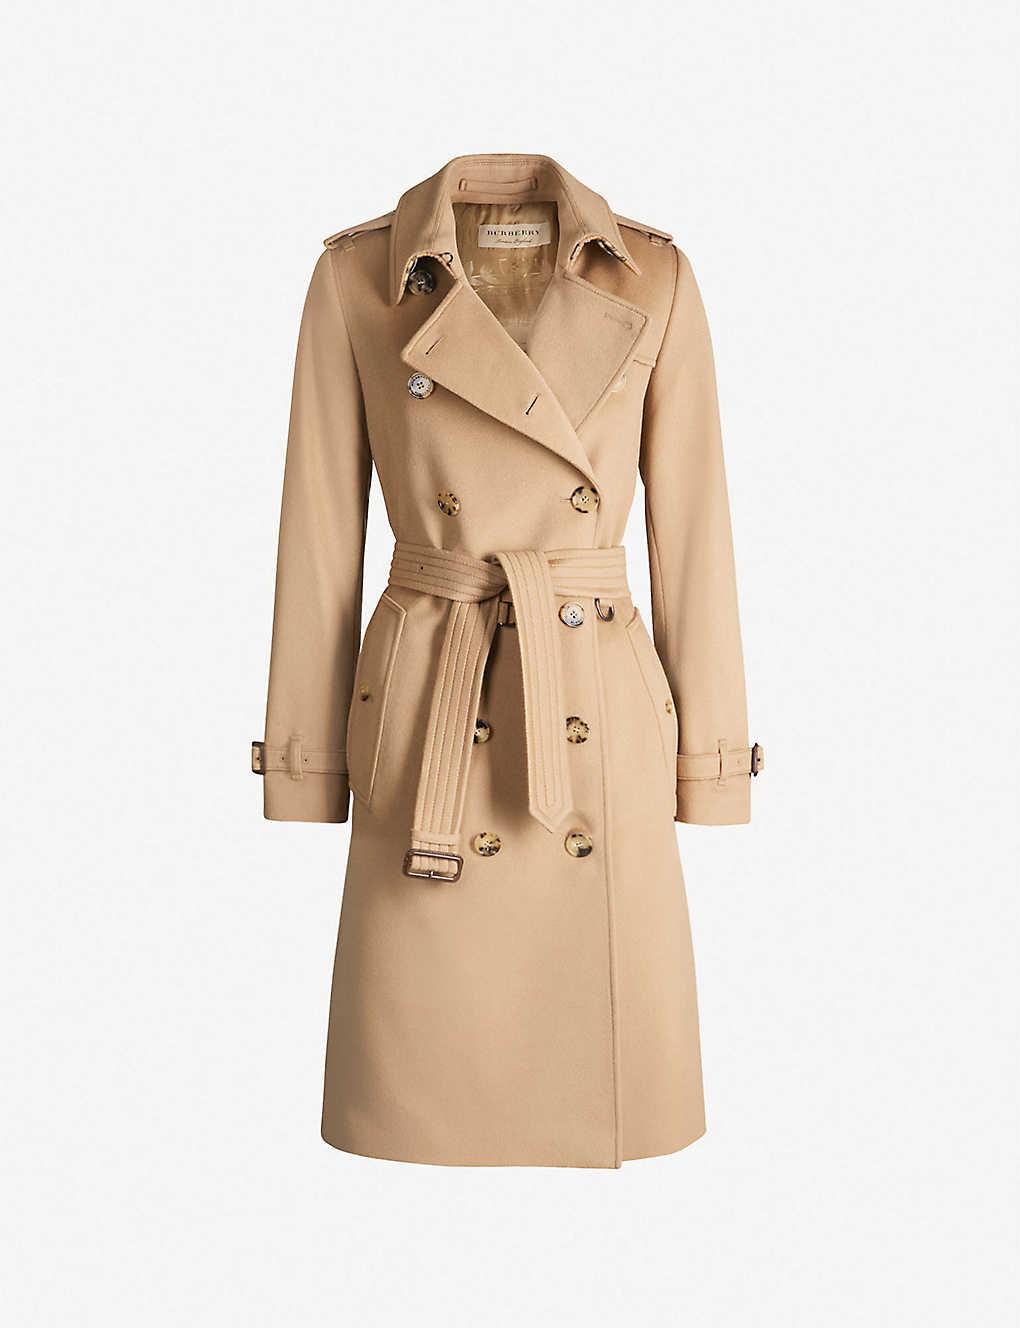 2b9531ec The Kensington Heritage long cotton trench coat